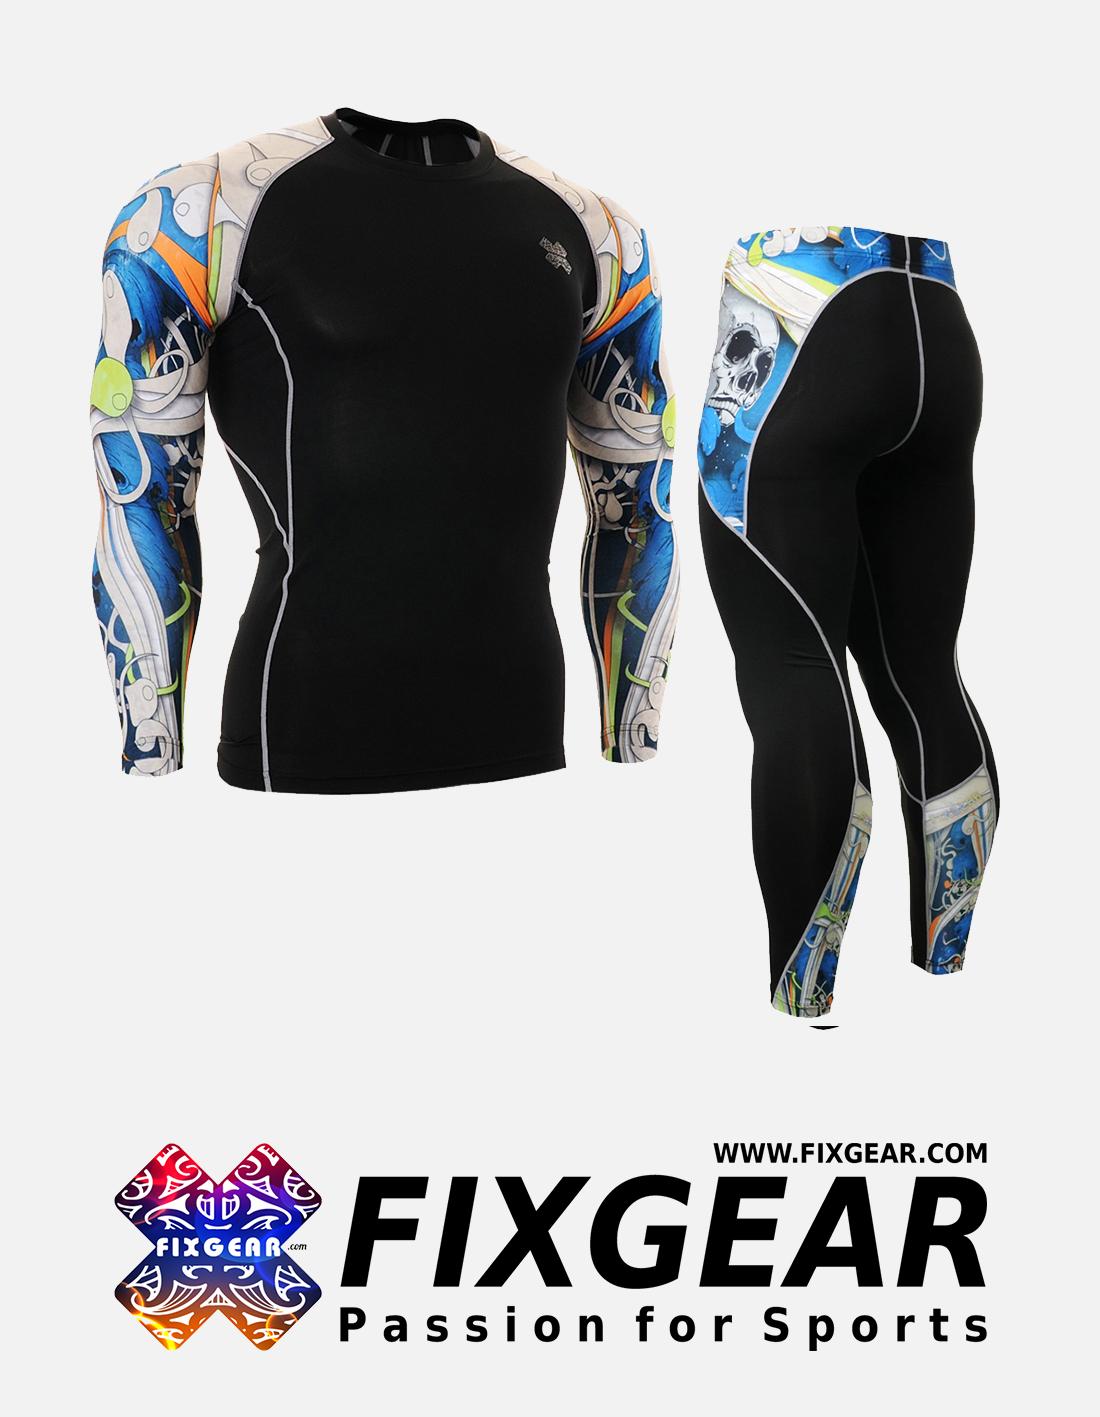 FIXGEAR CPD-P2L-B19B Set Compression Base Layer Shirt & Legging Pants